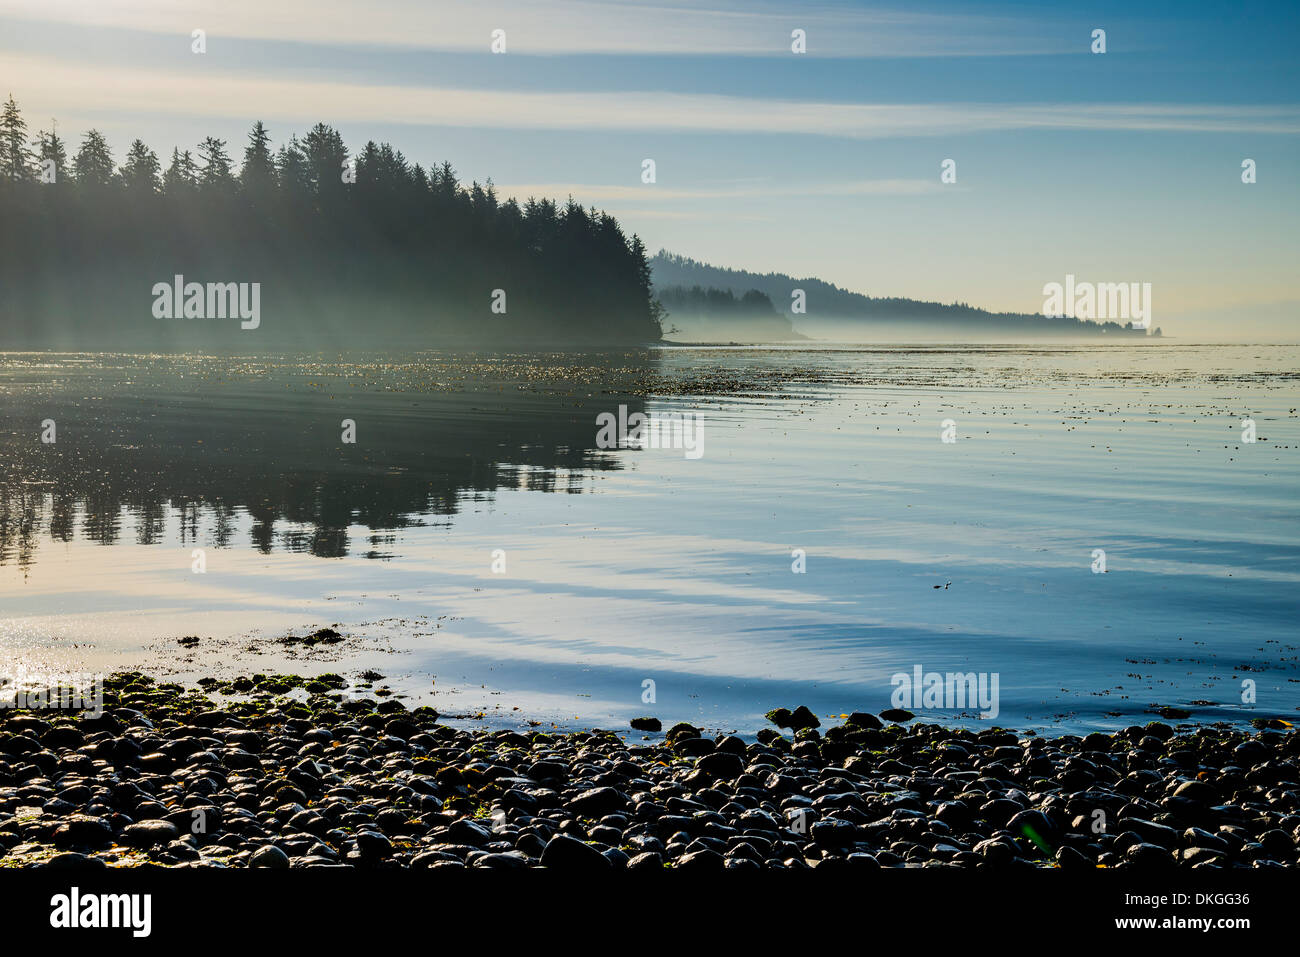 Pebble beach, Jordan River, Vancouver Island, British Columbia, Canada - Stock Image